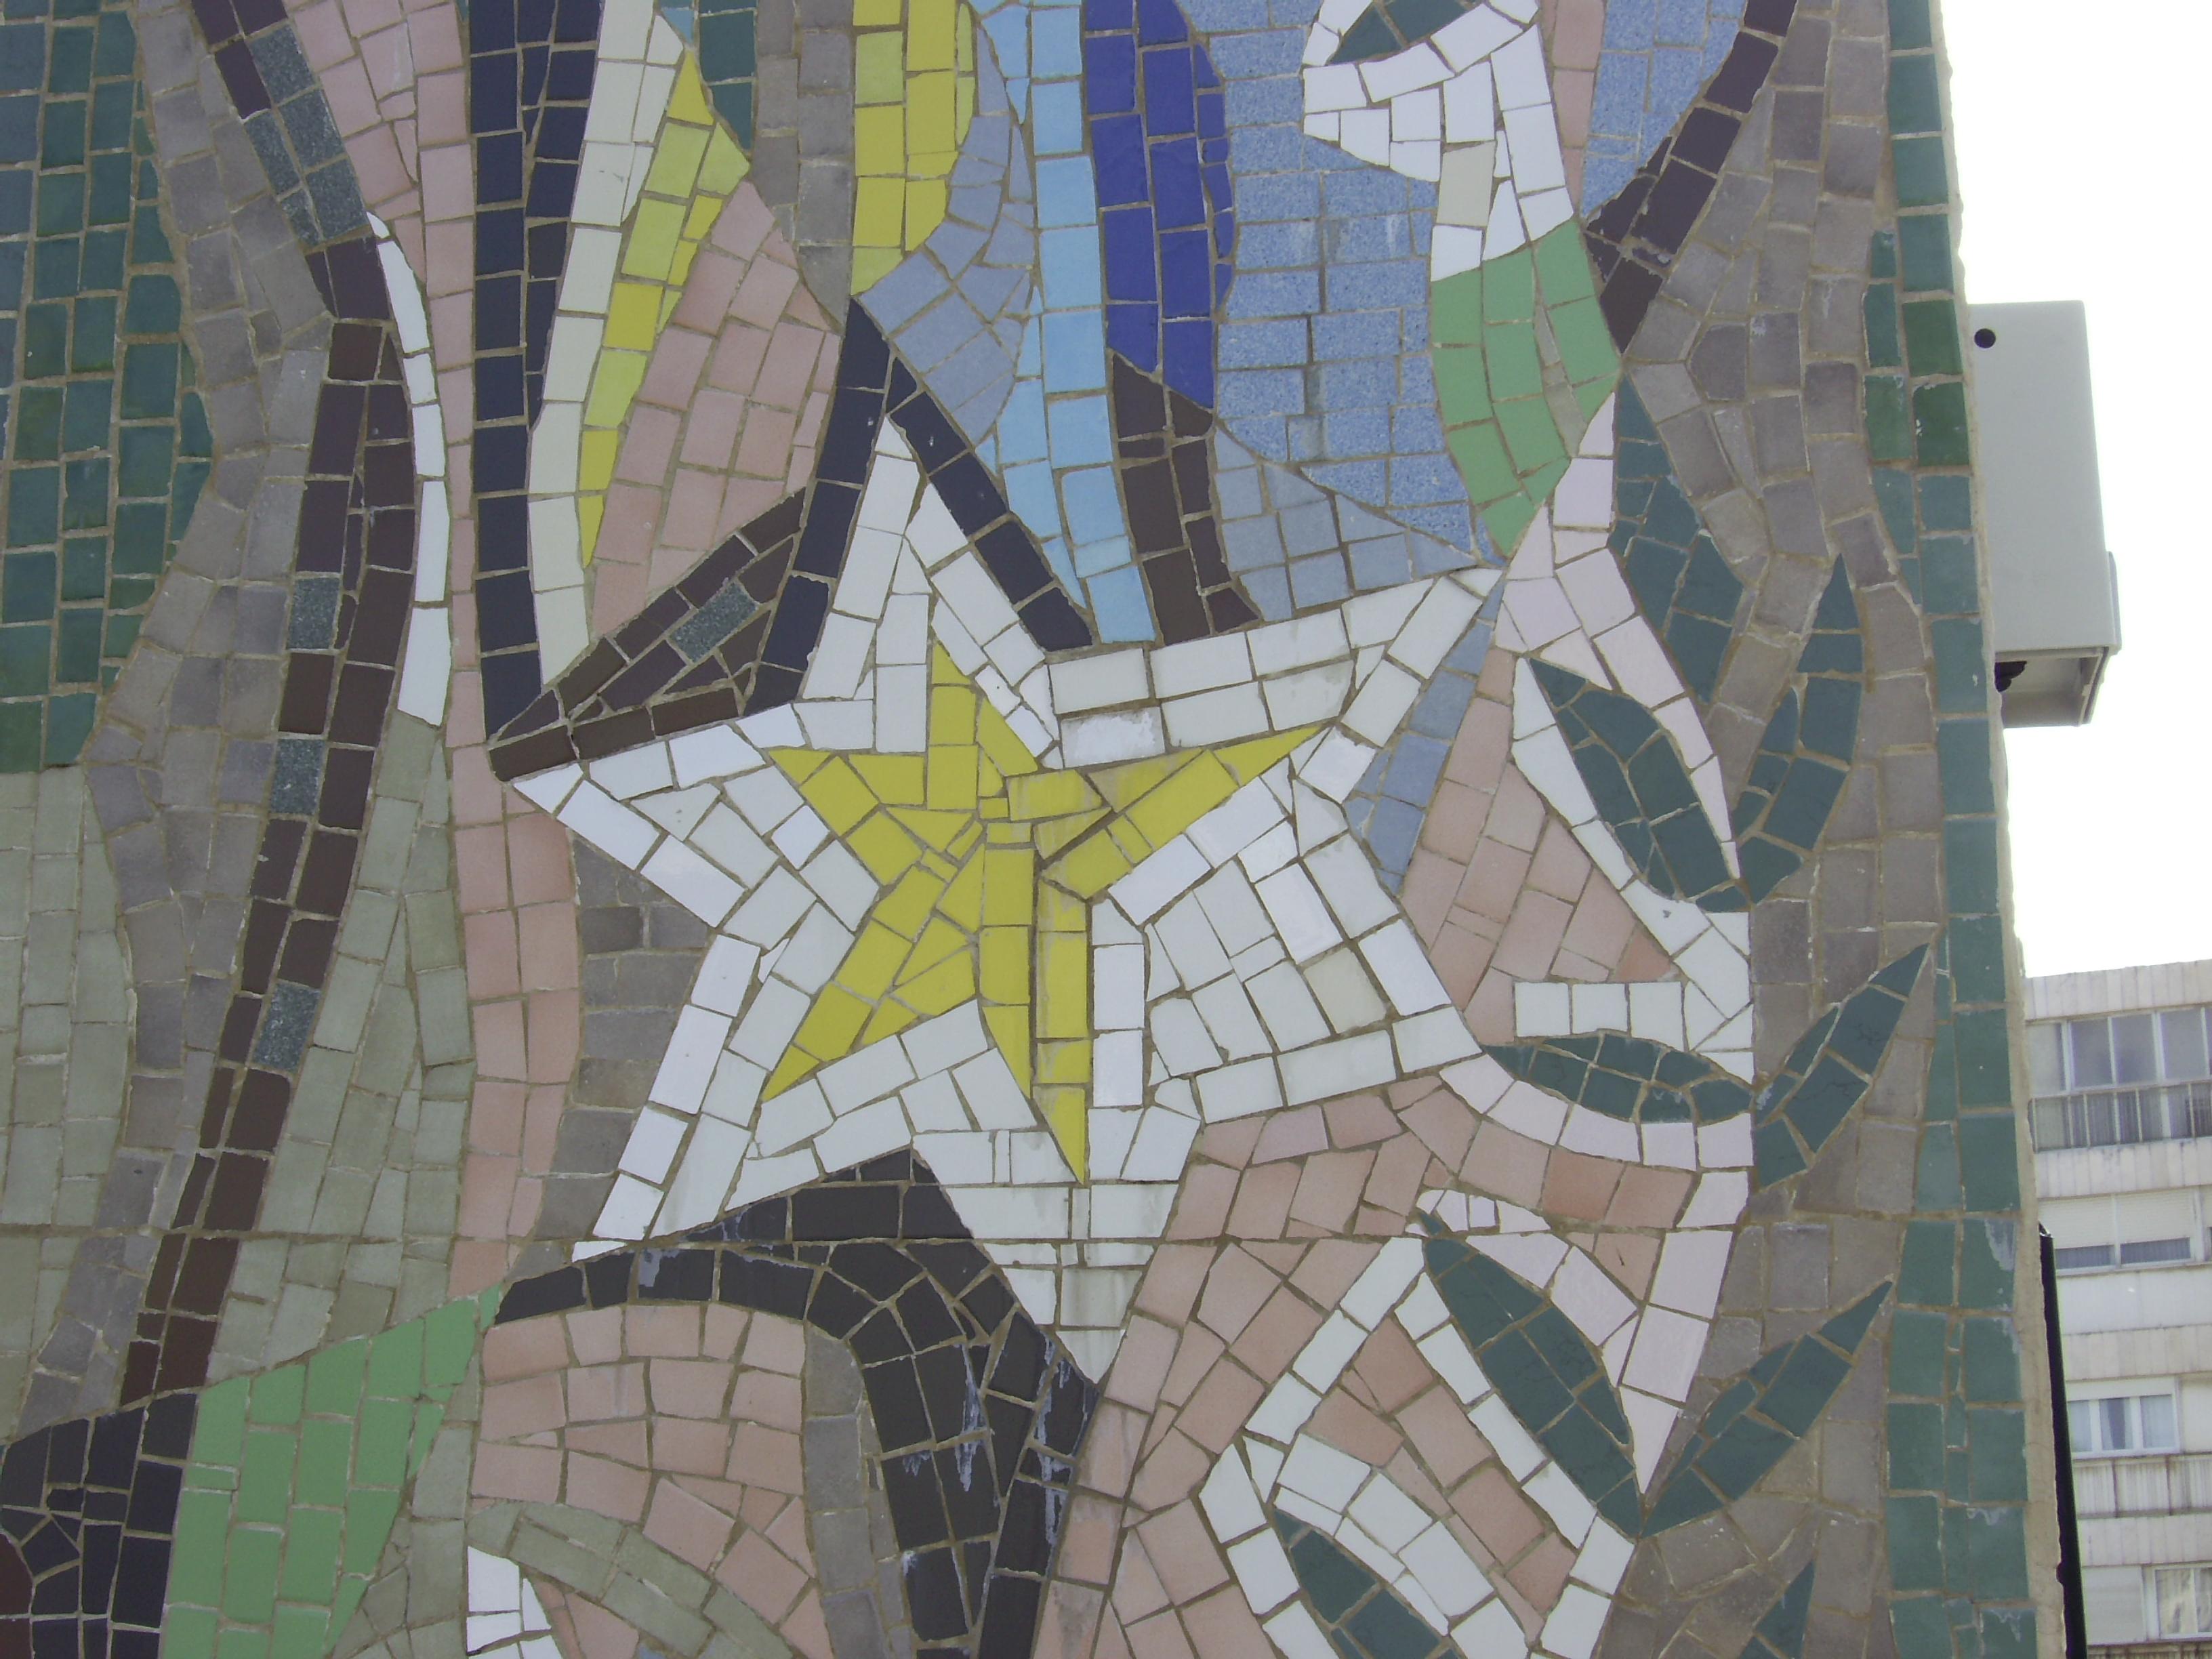 FileModern Mosaic Jerusalem 1 3211896001jpg FileModern Mosaic Jerusalem 1